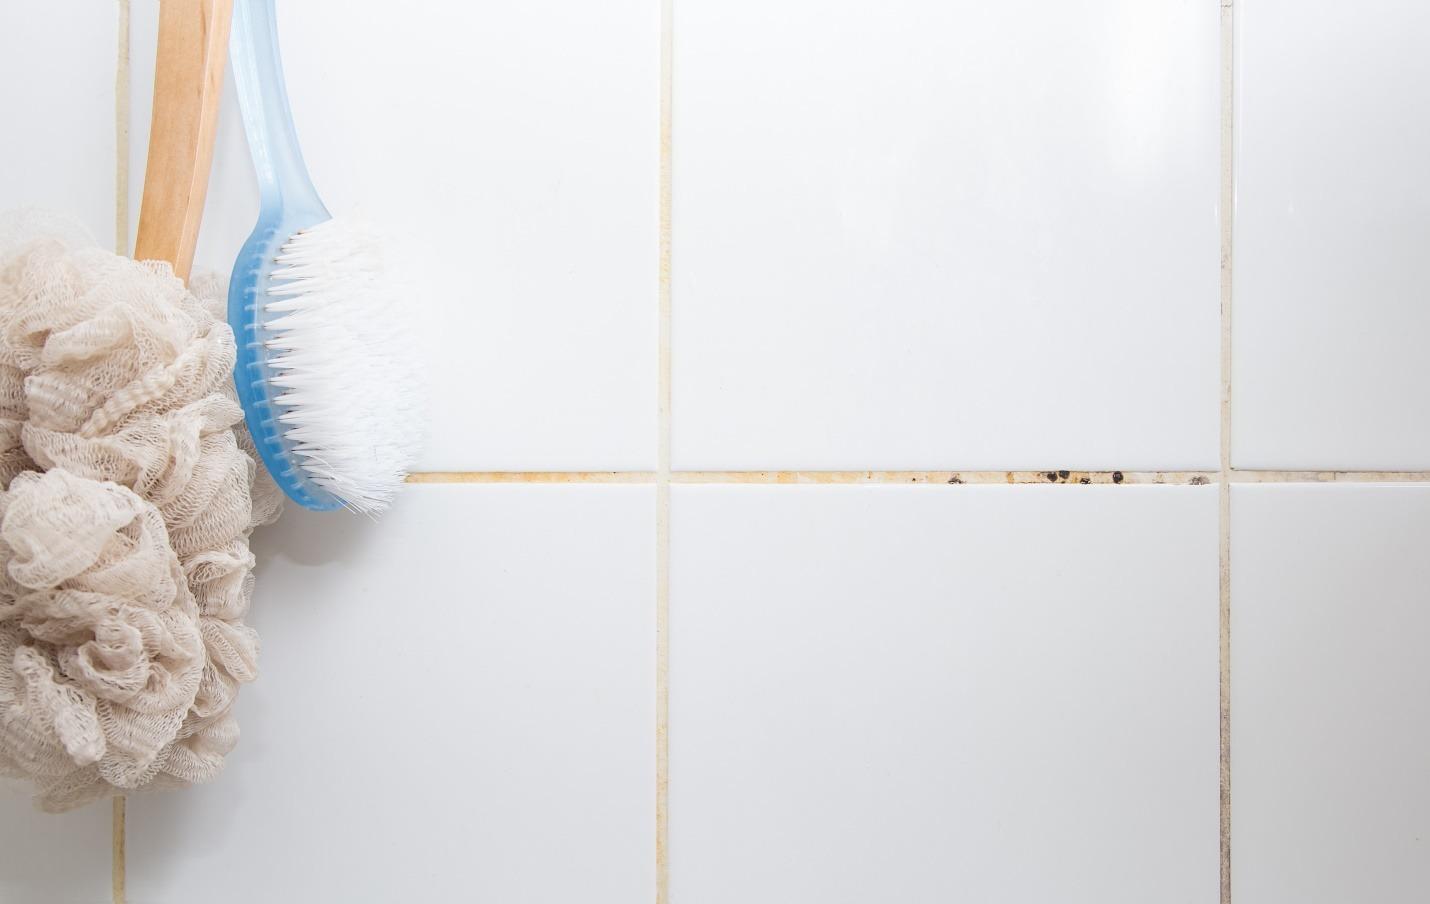 to repair water damaged shower walls